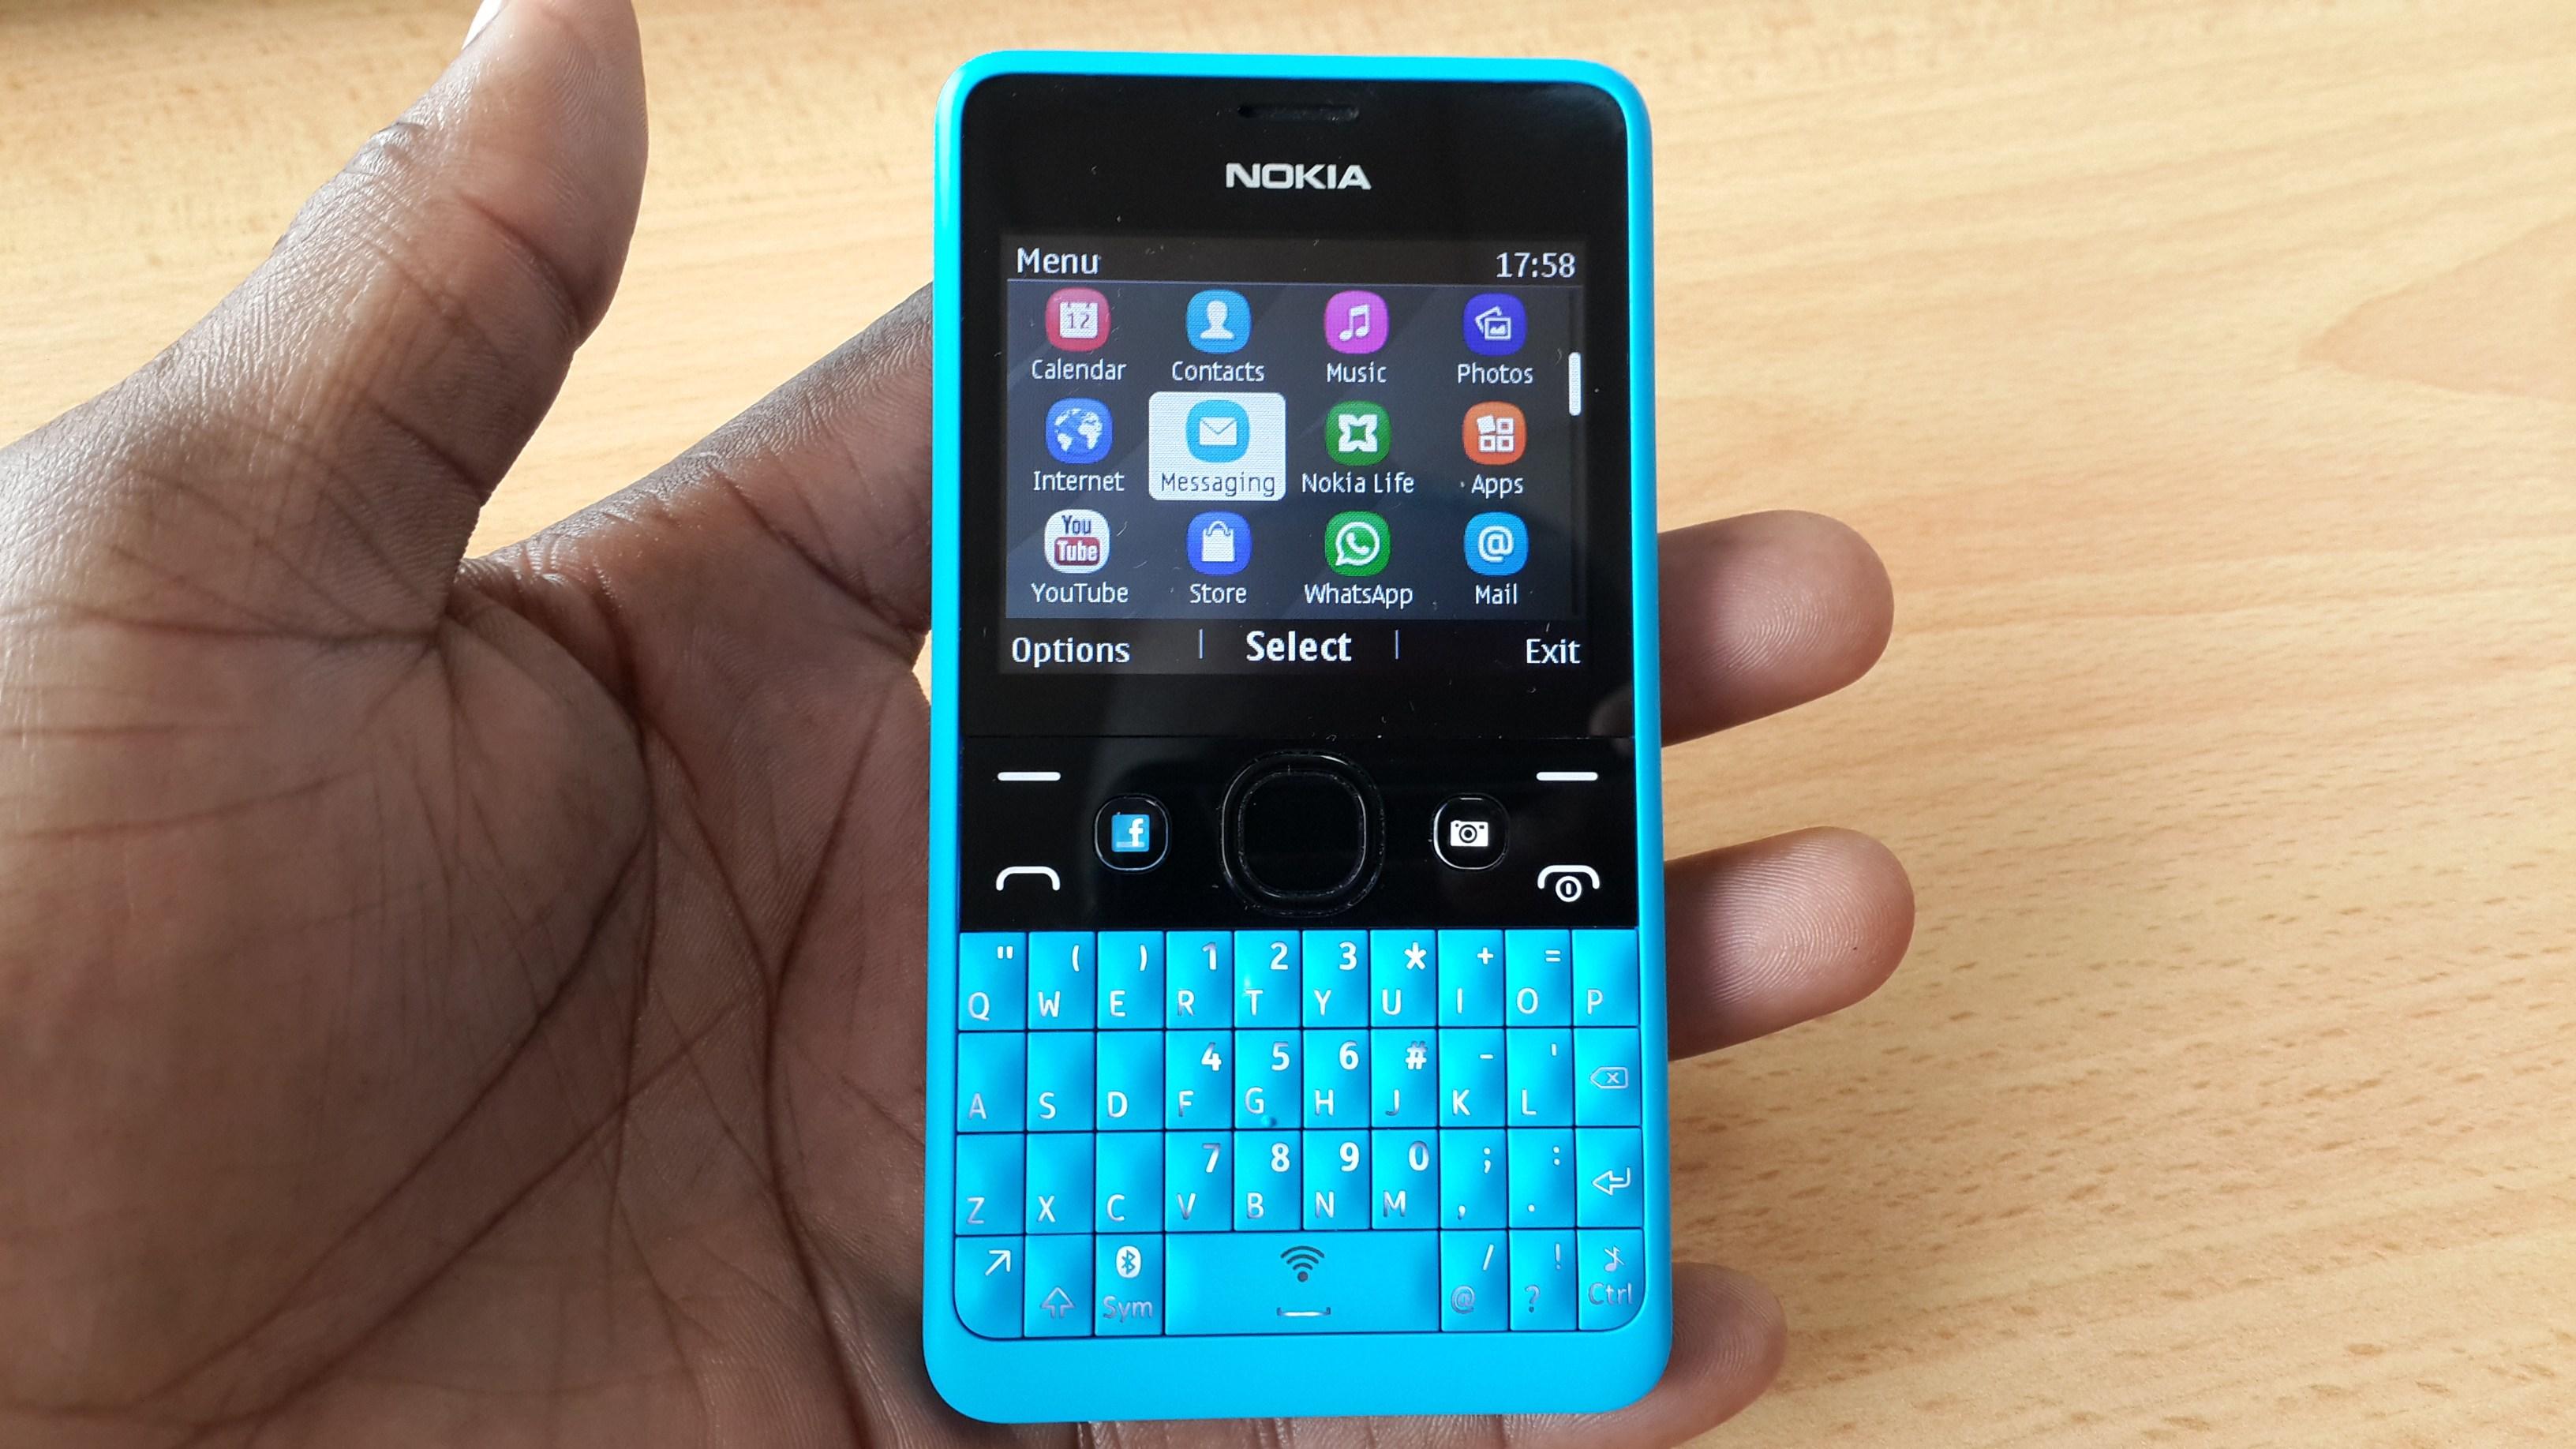 Attiva Wifi sui telefoni Nokia Asha Guarda com'è facile! 2